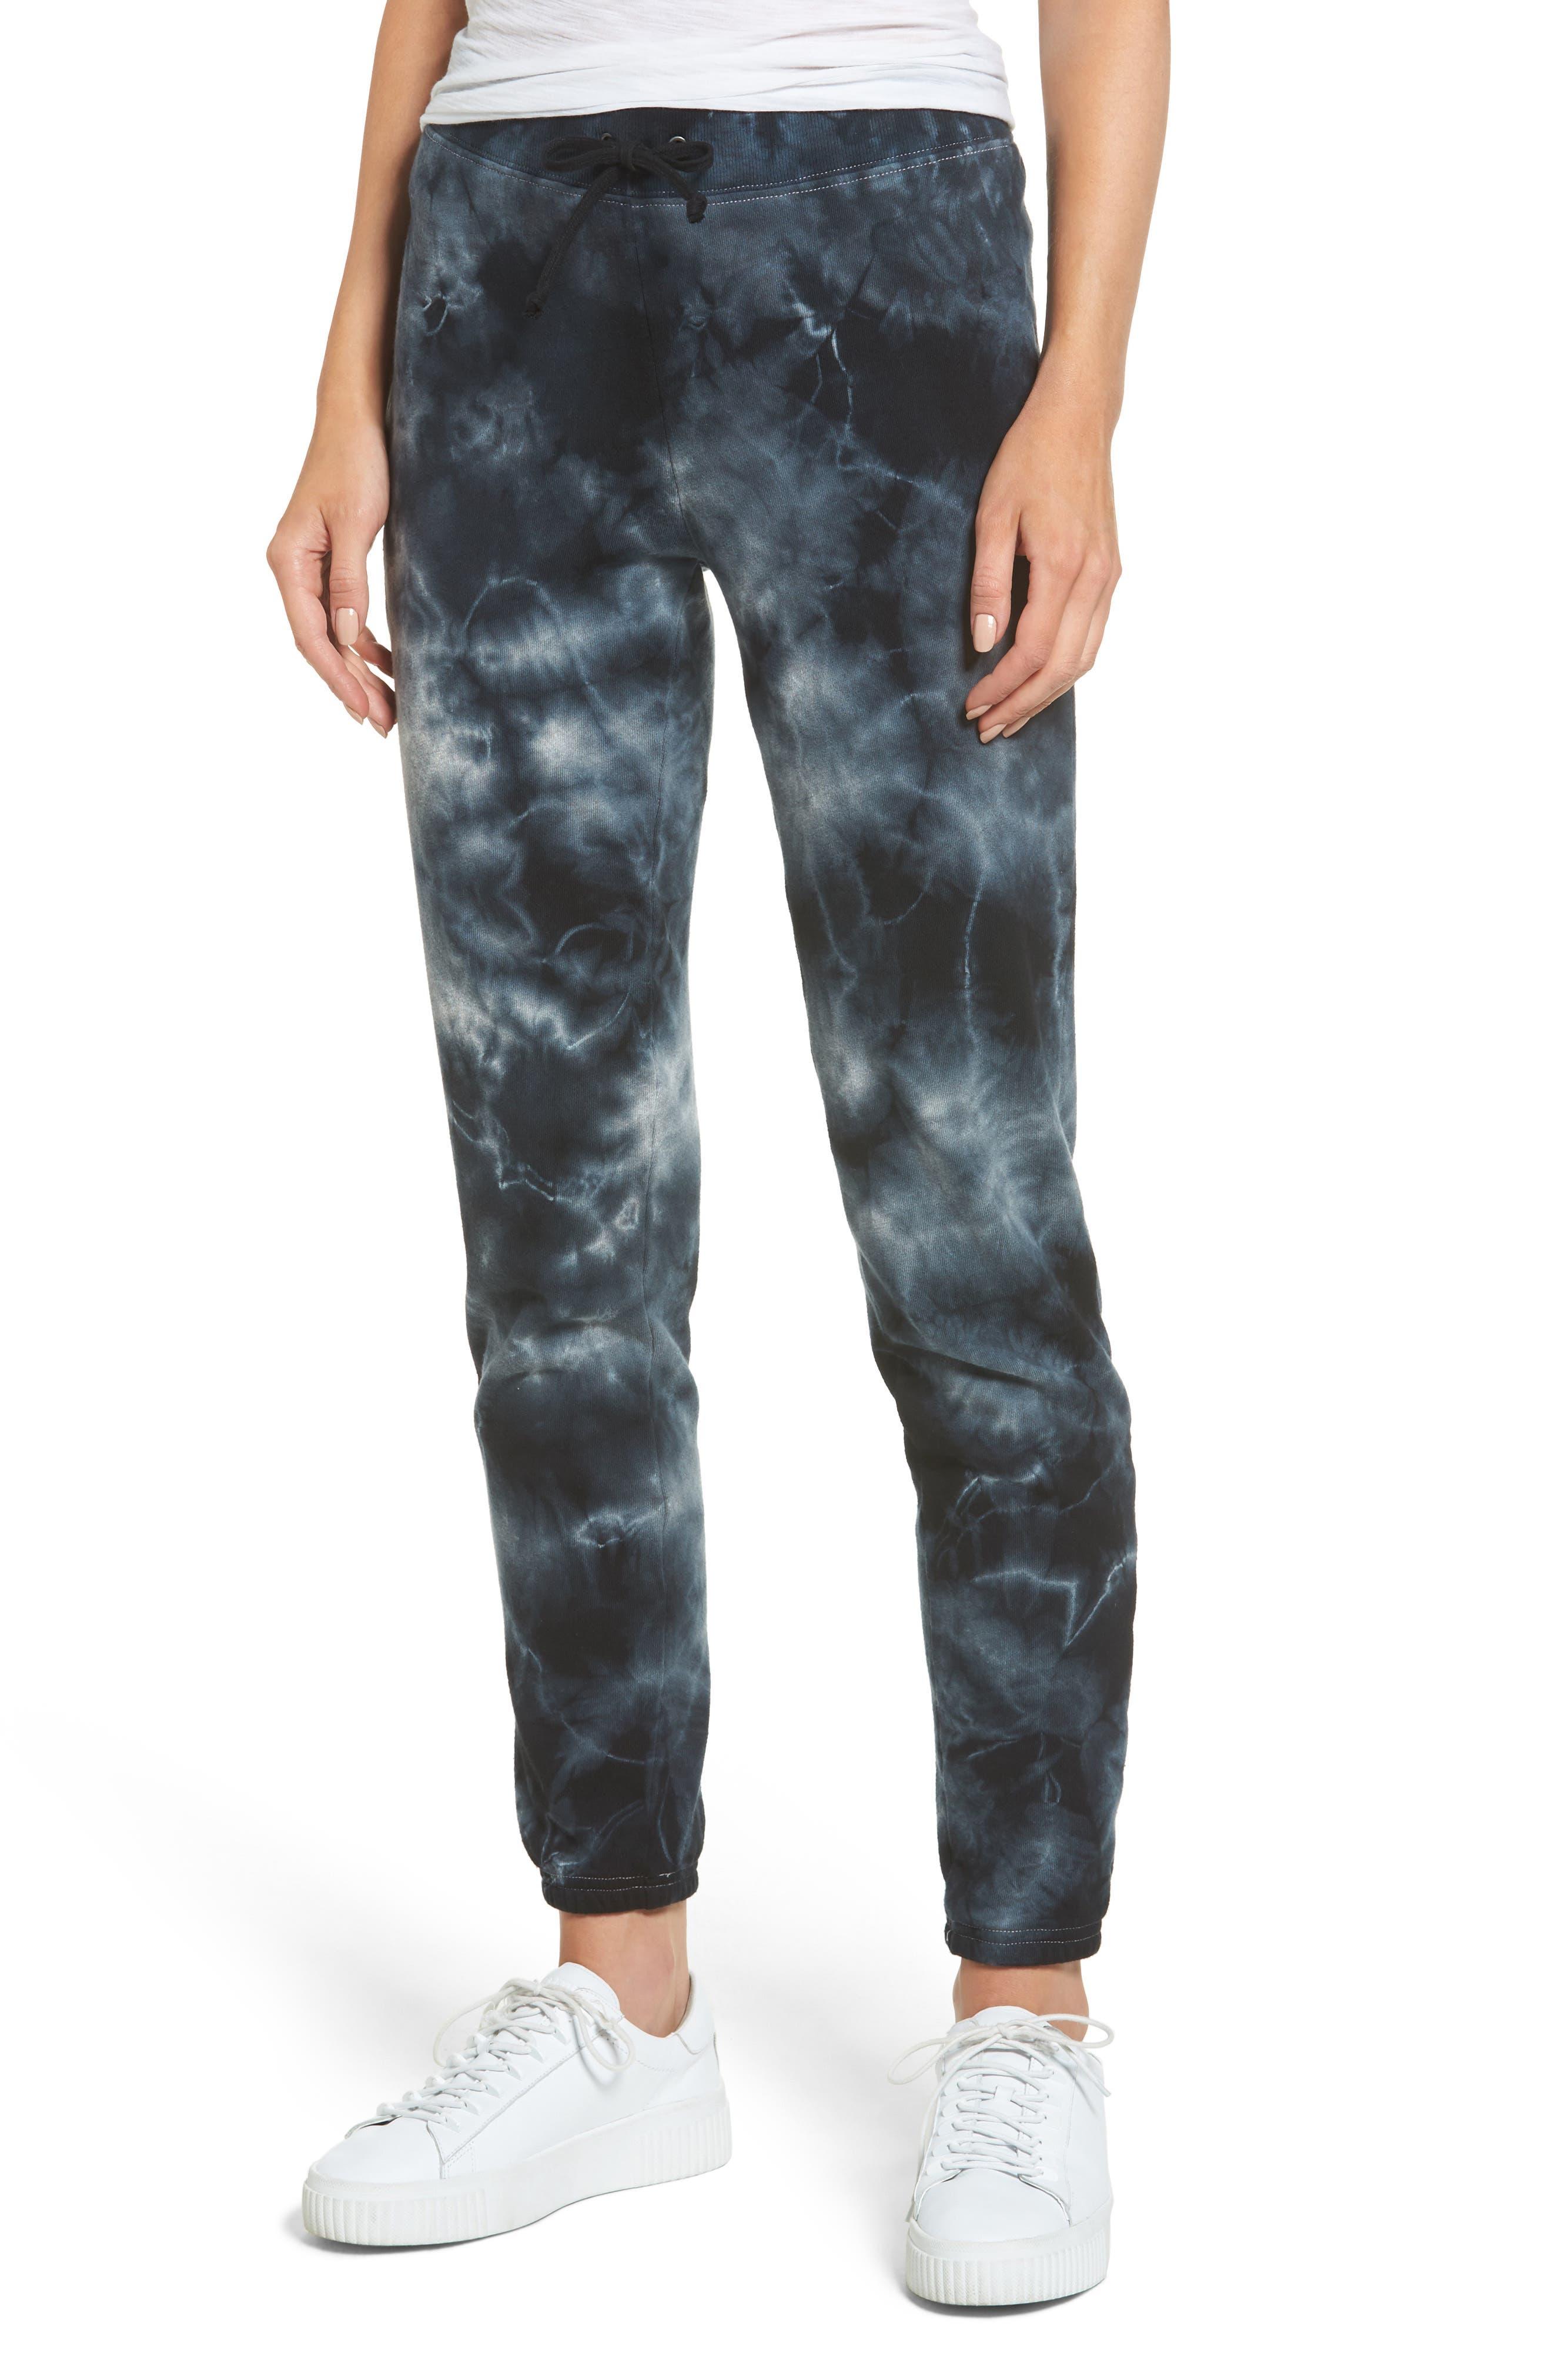 Main Image - Pam & Gela Tie Dye Knit Pants